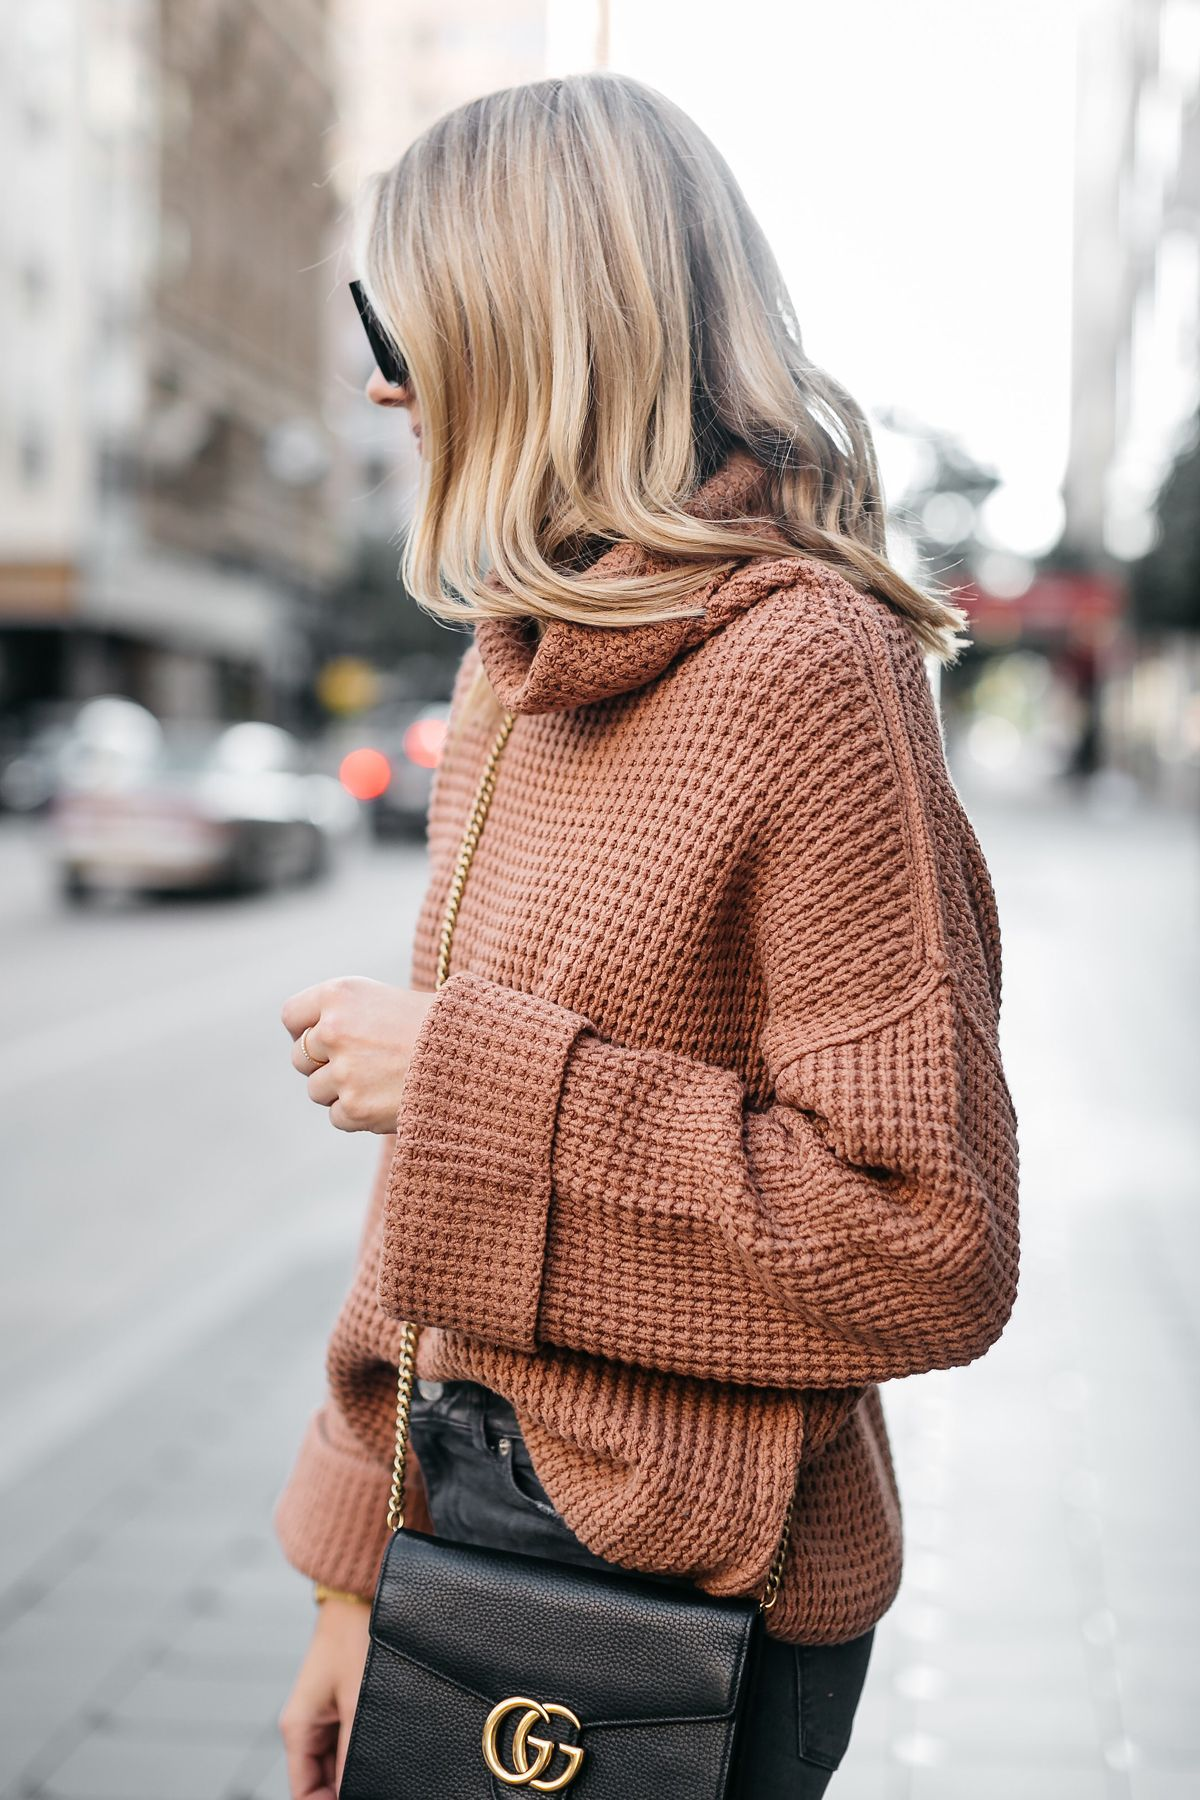 Fashion Jackson Oversized Sweater Free People Park City Pullover Tan  Sweater Gucci Marmont Handbag 2 8a6de3fde